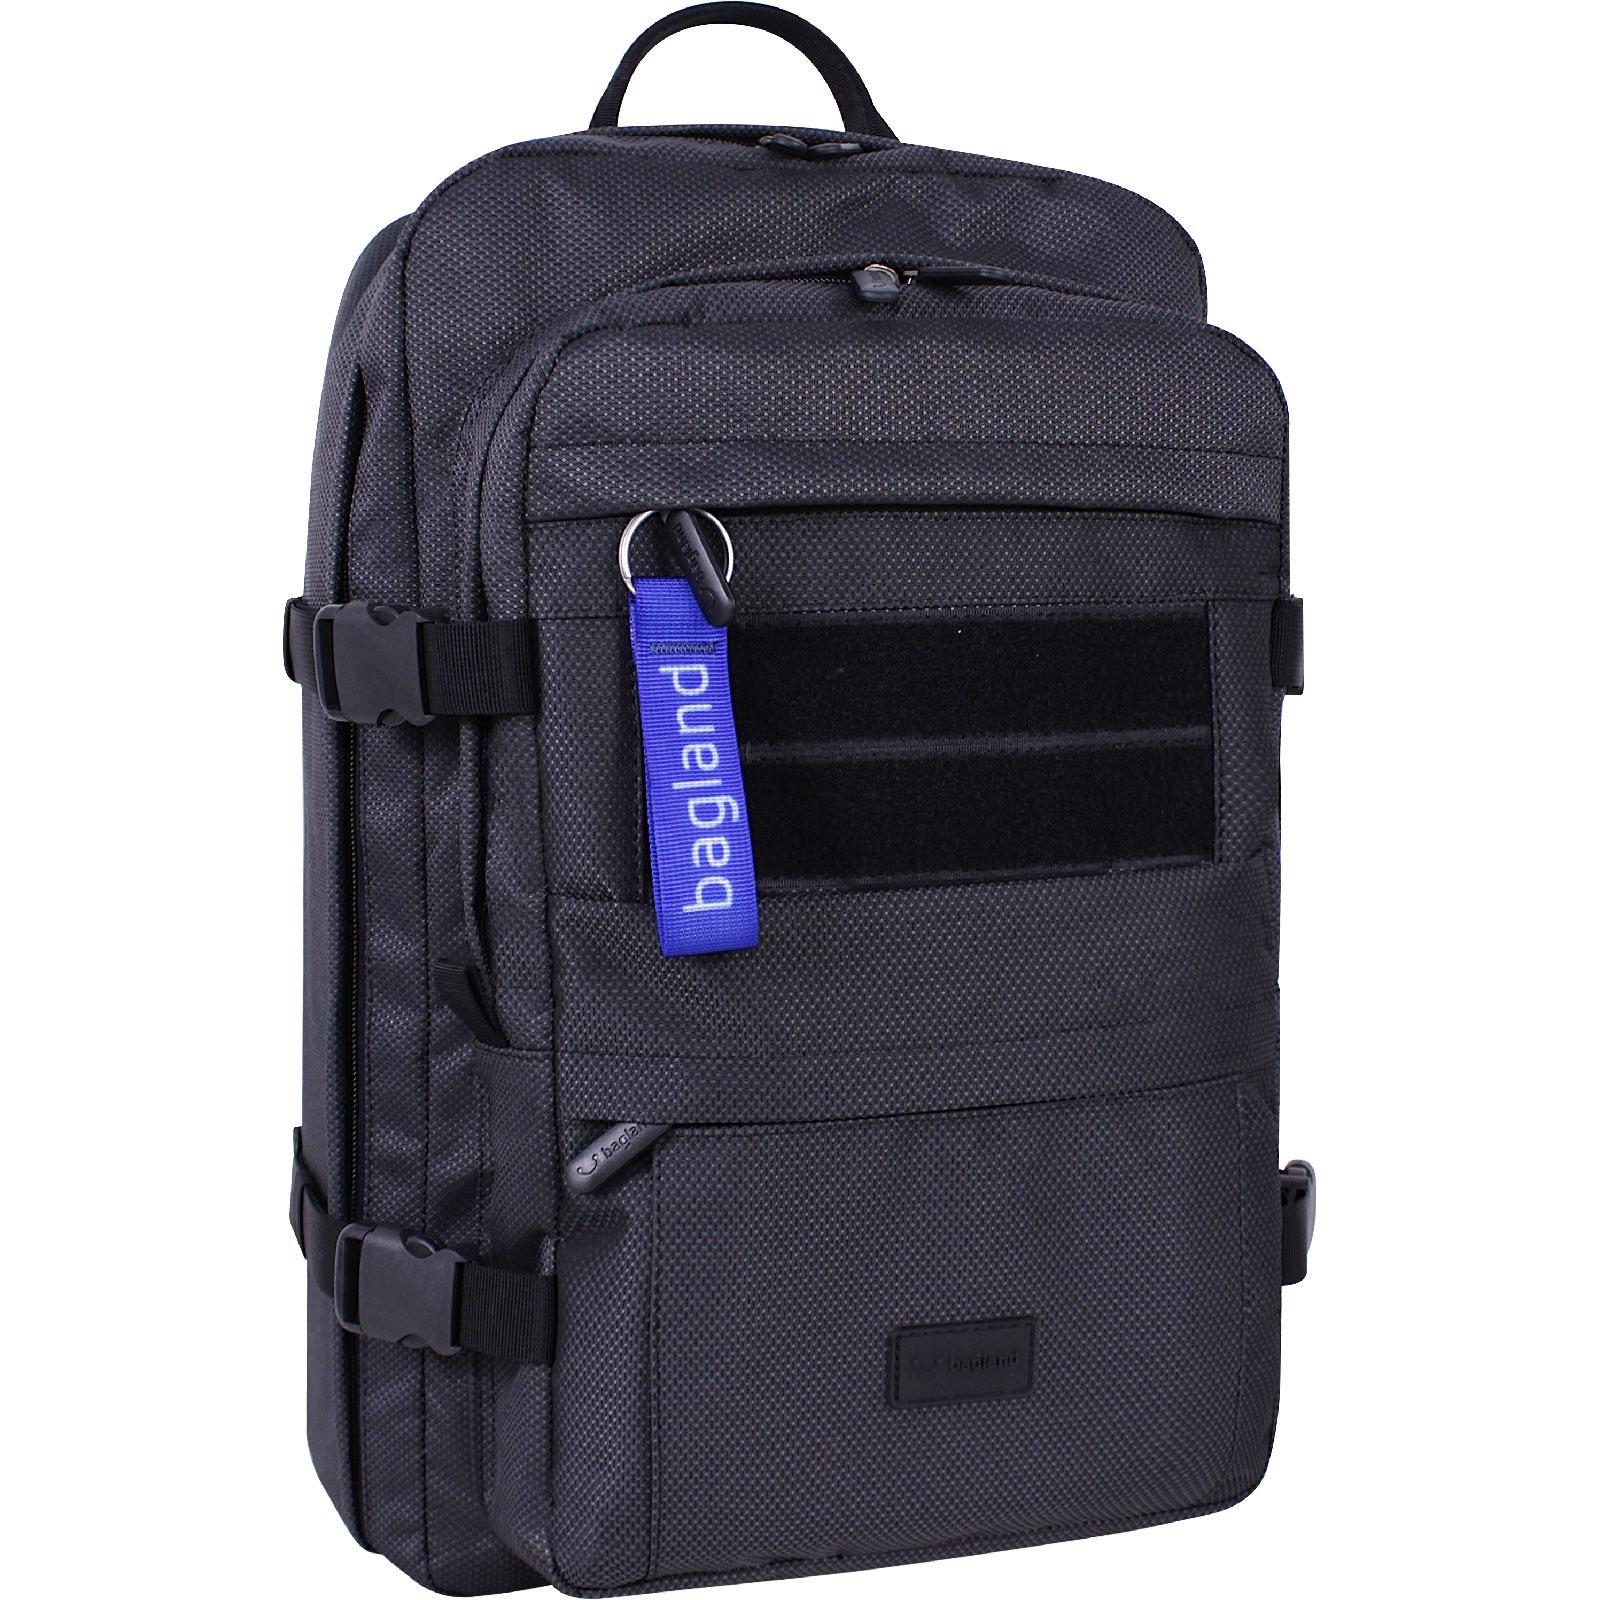 Рюкзаки для ноутбука Рюкзак для ноутбука Bagland Specter 23 л. Чёрный (00157169) IMG_0155.jpg